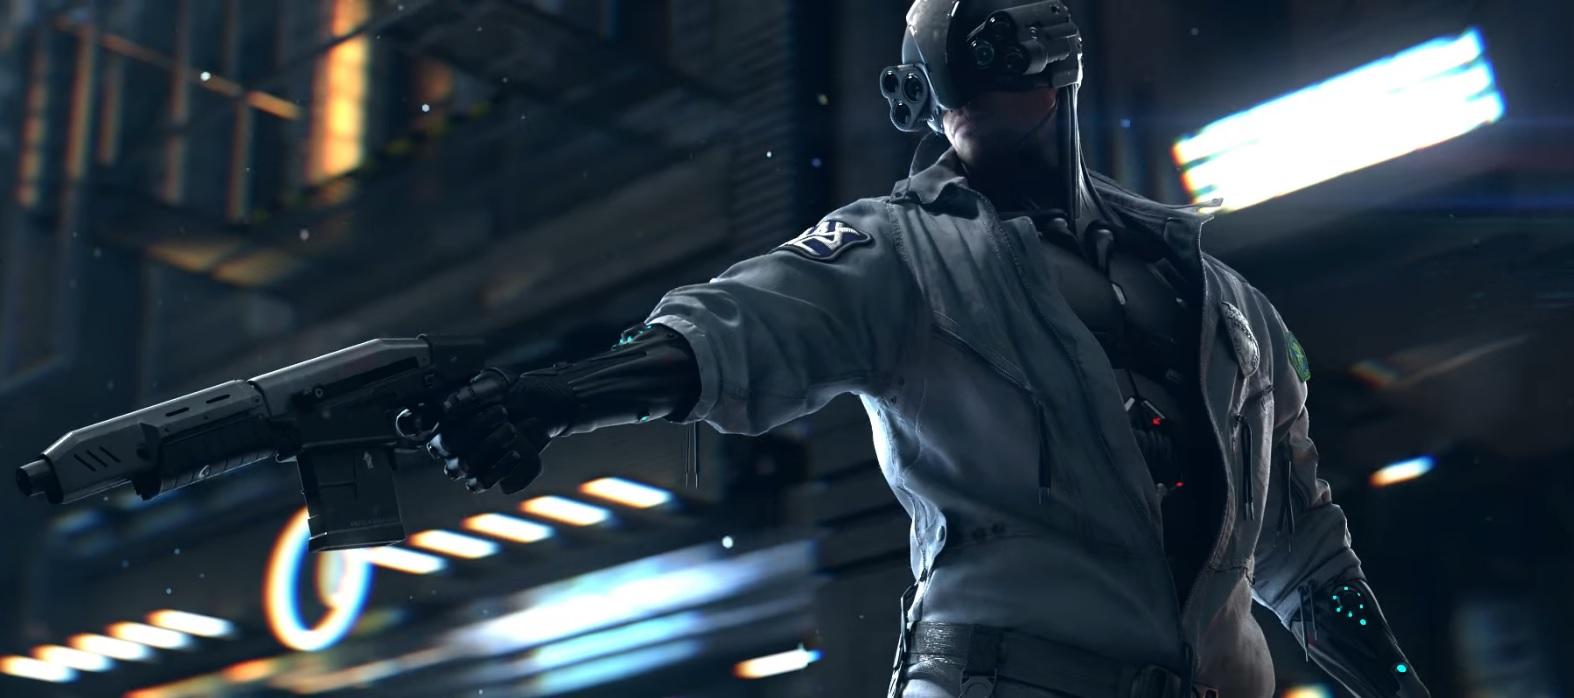 Cyberpunk Police man